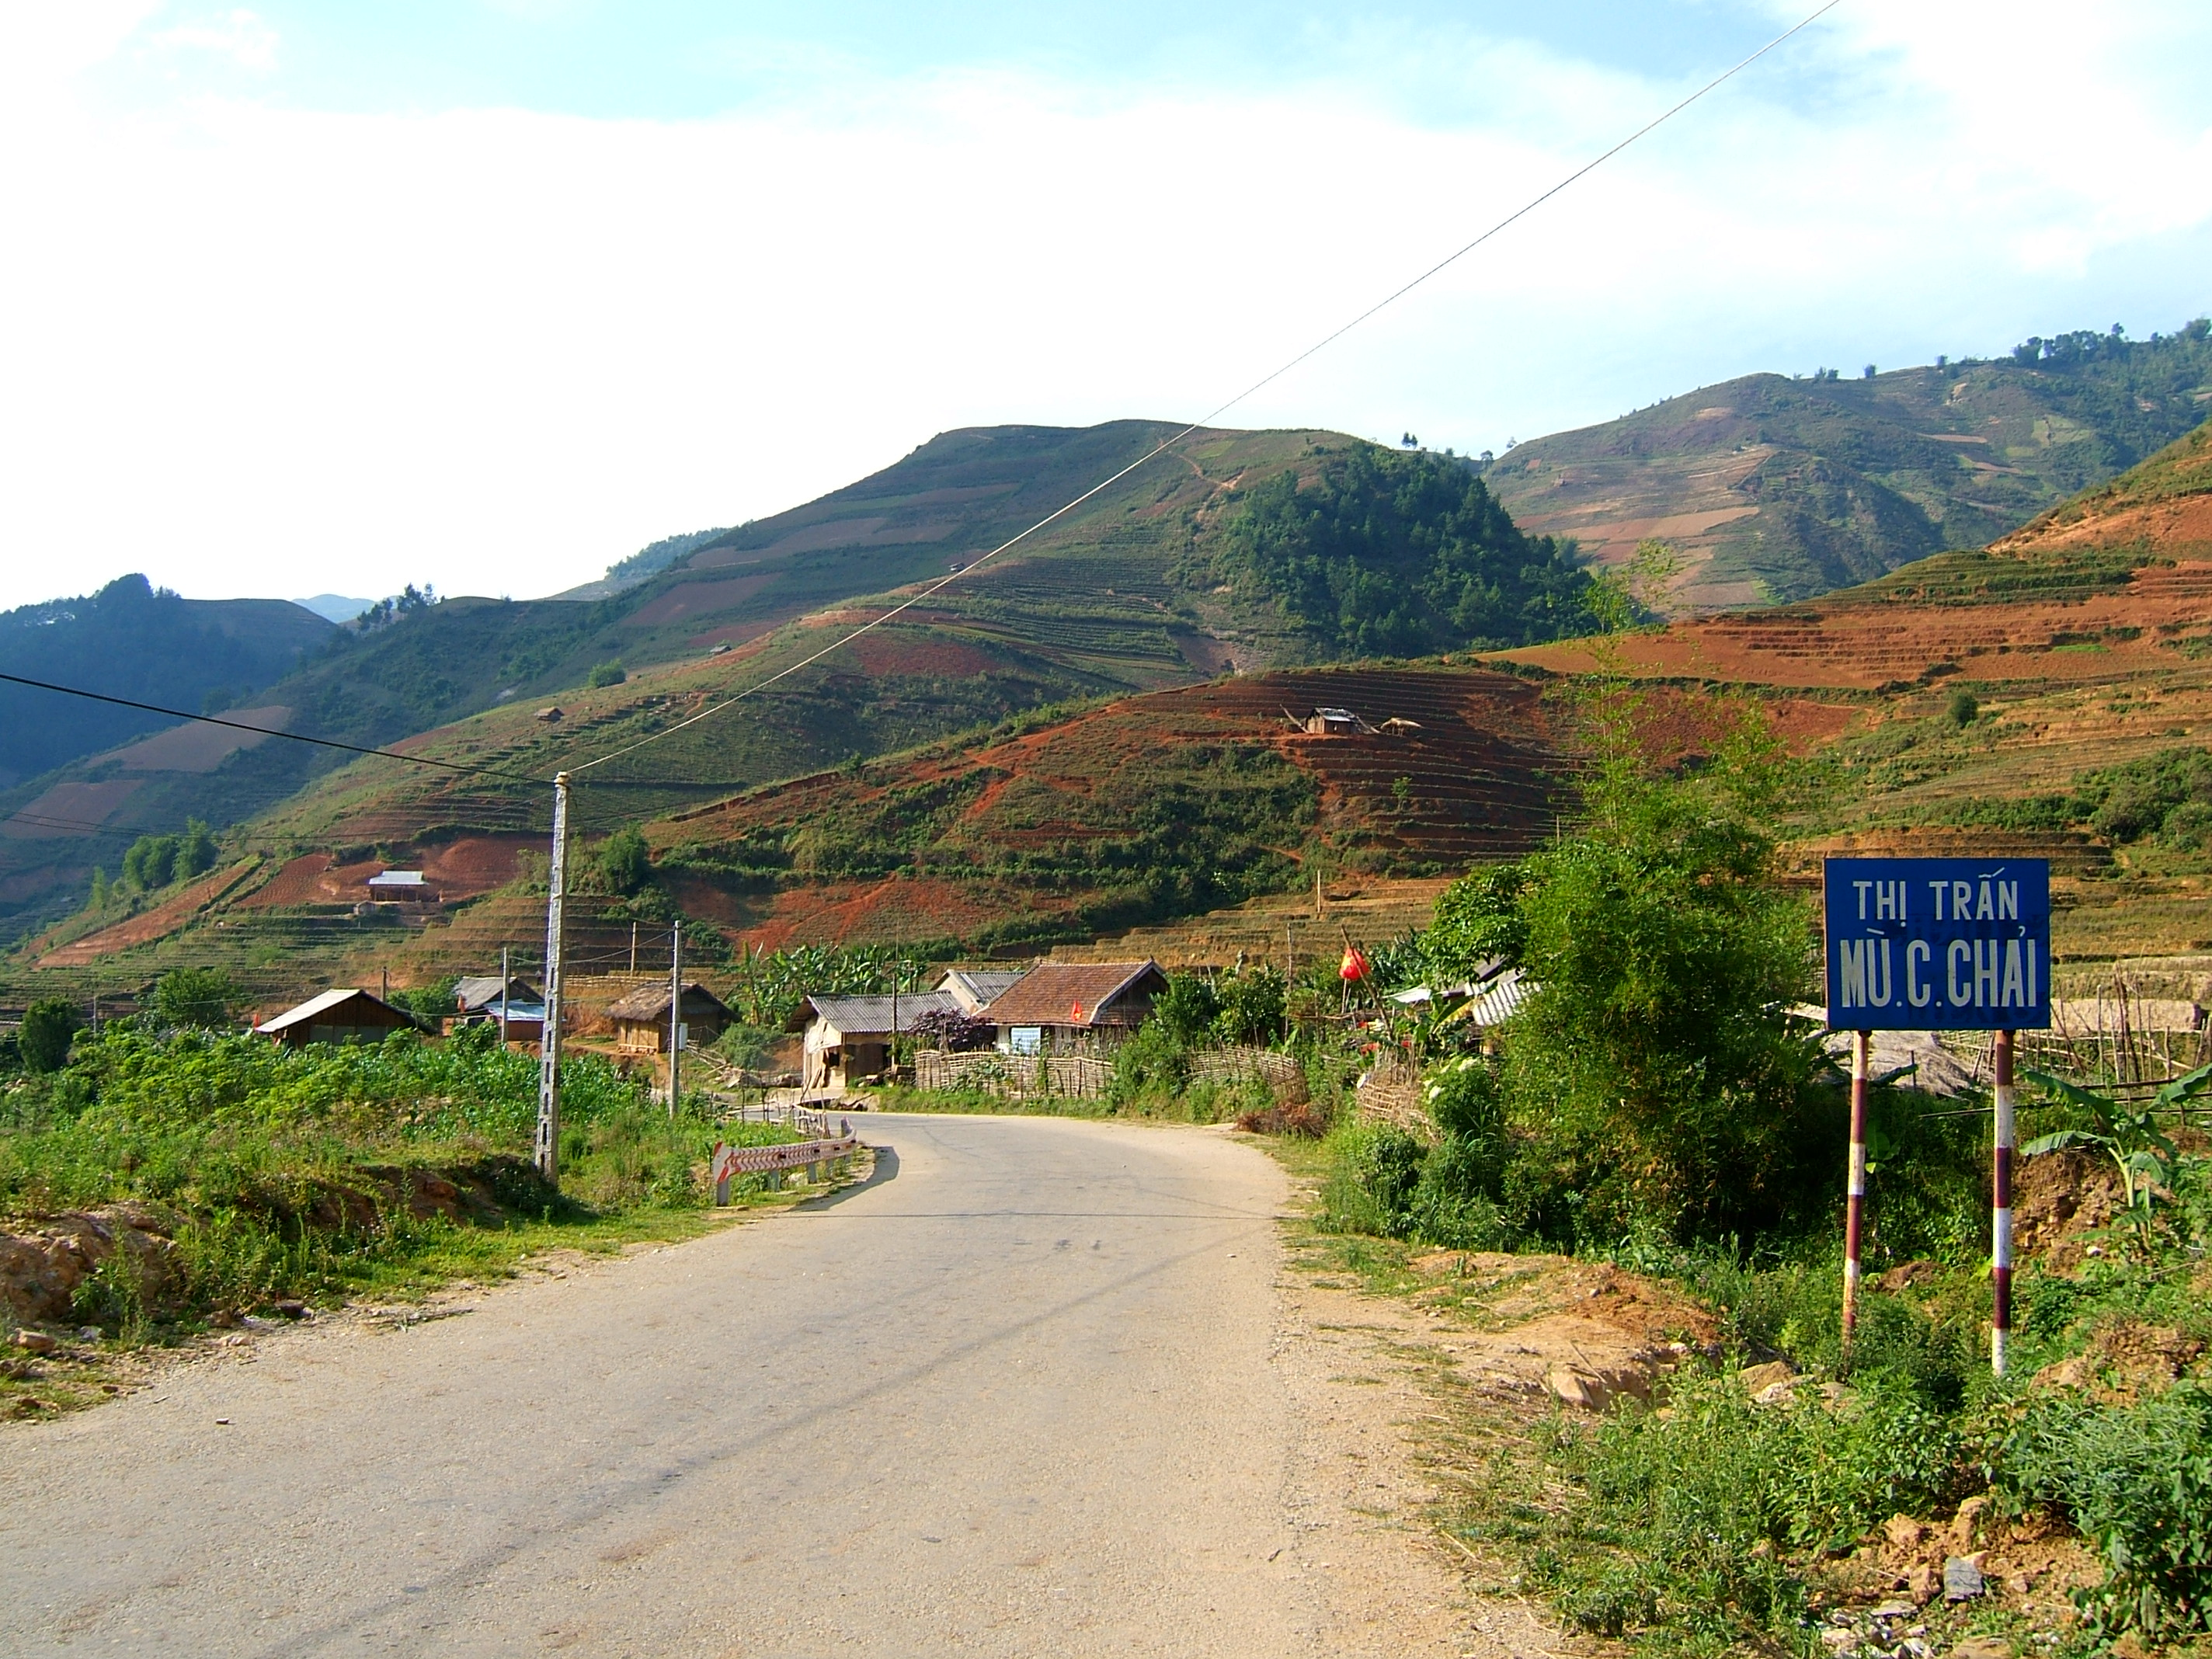 mu cang chai district - photo #21